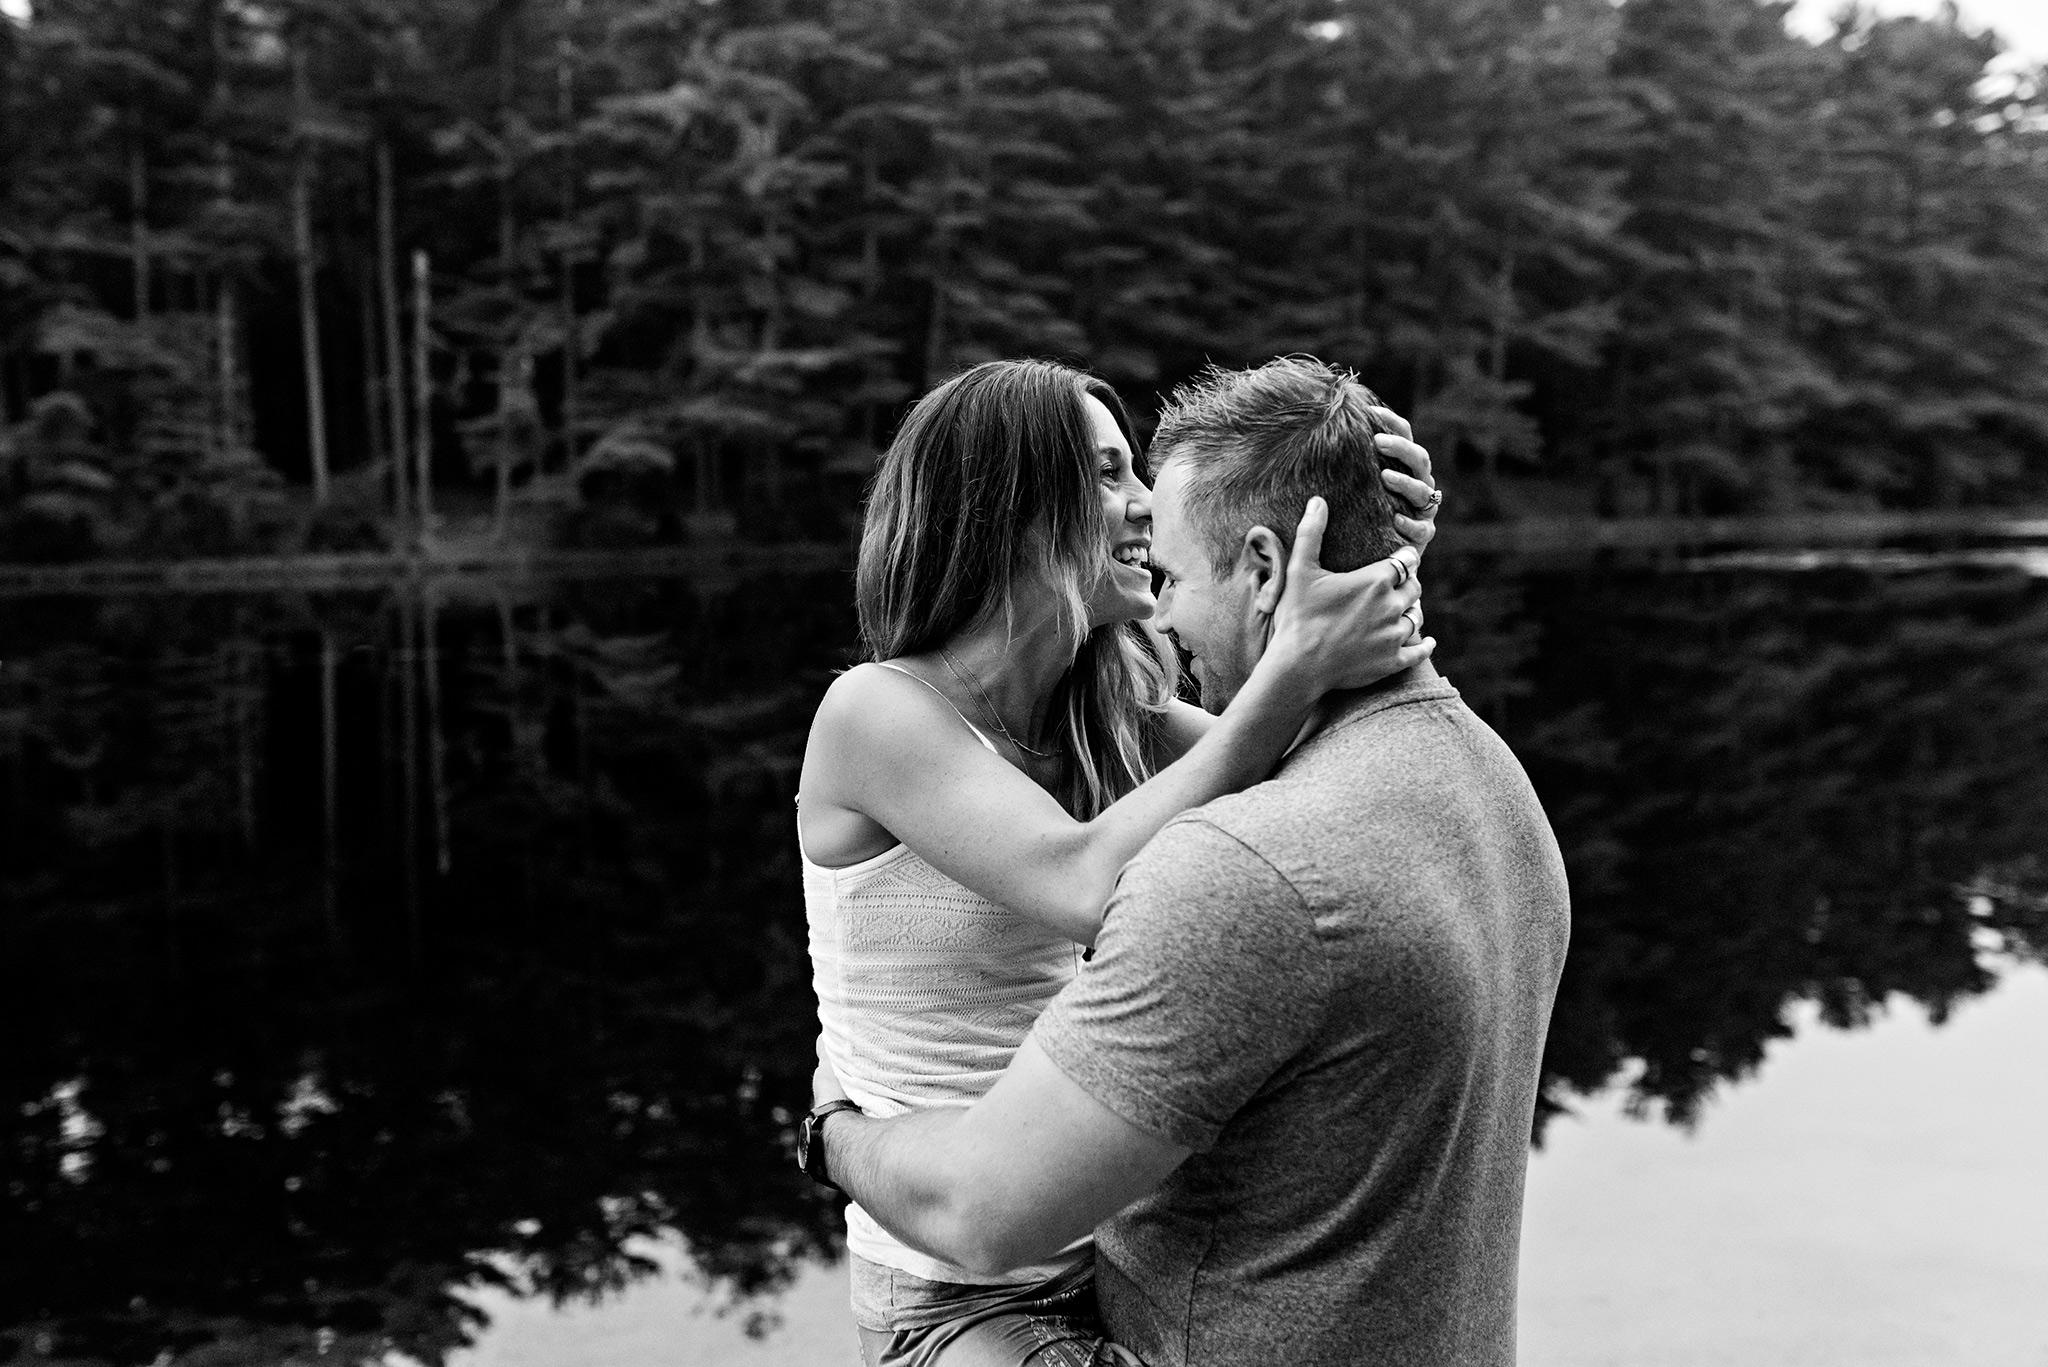 ct wedding anniversary photography, elopement photographer ct